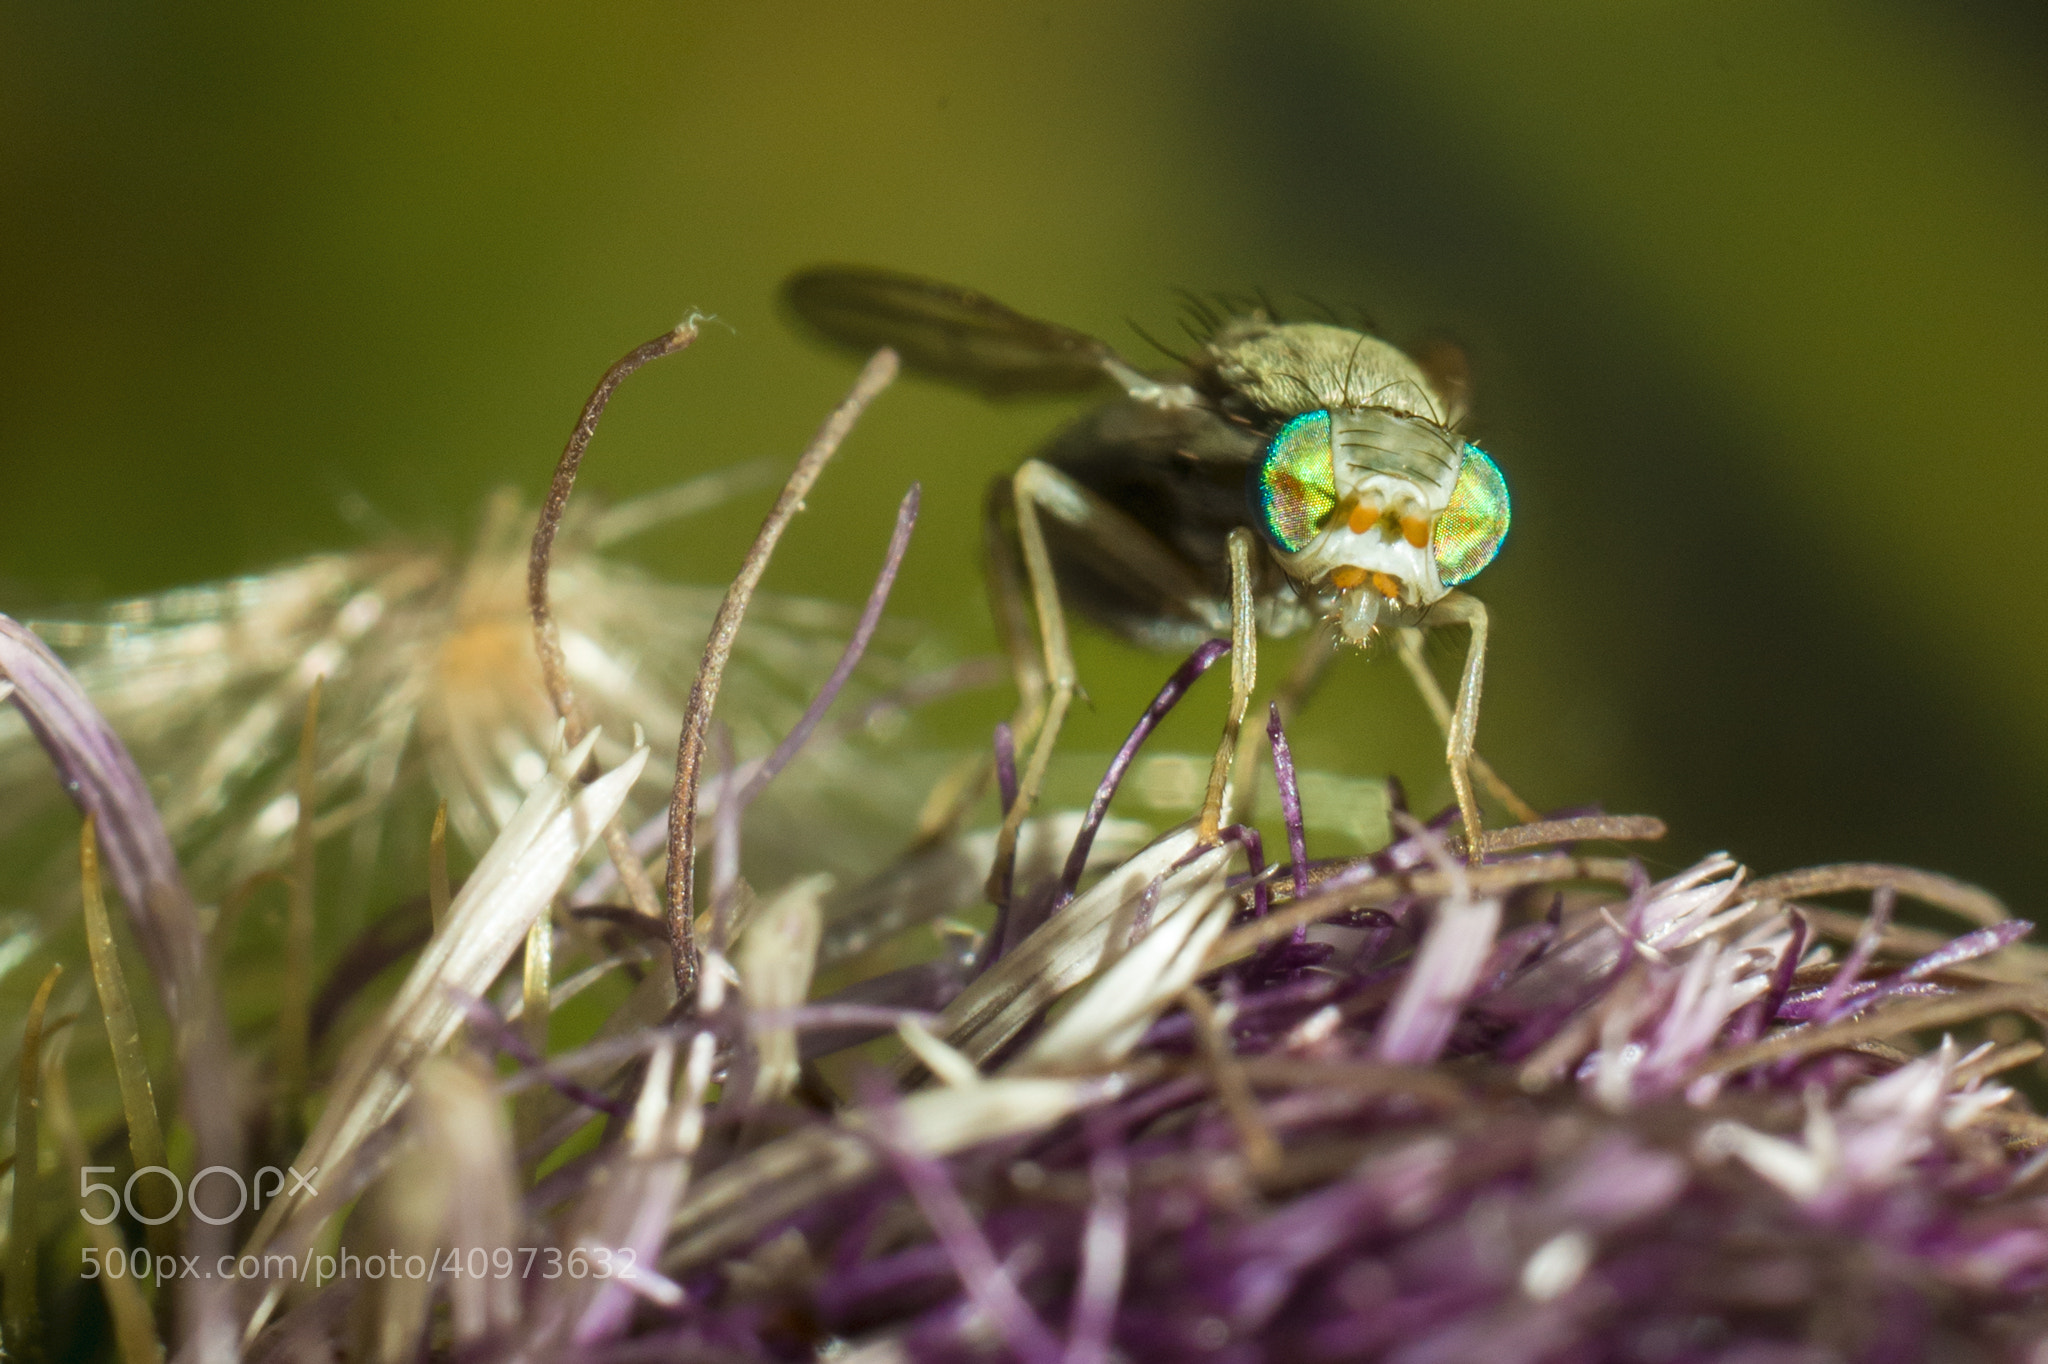 Photograph Green eyes by Alexej Mecheriakov on 500px